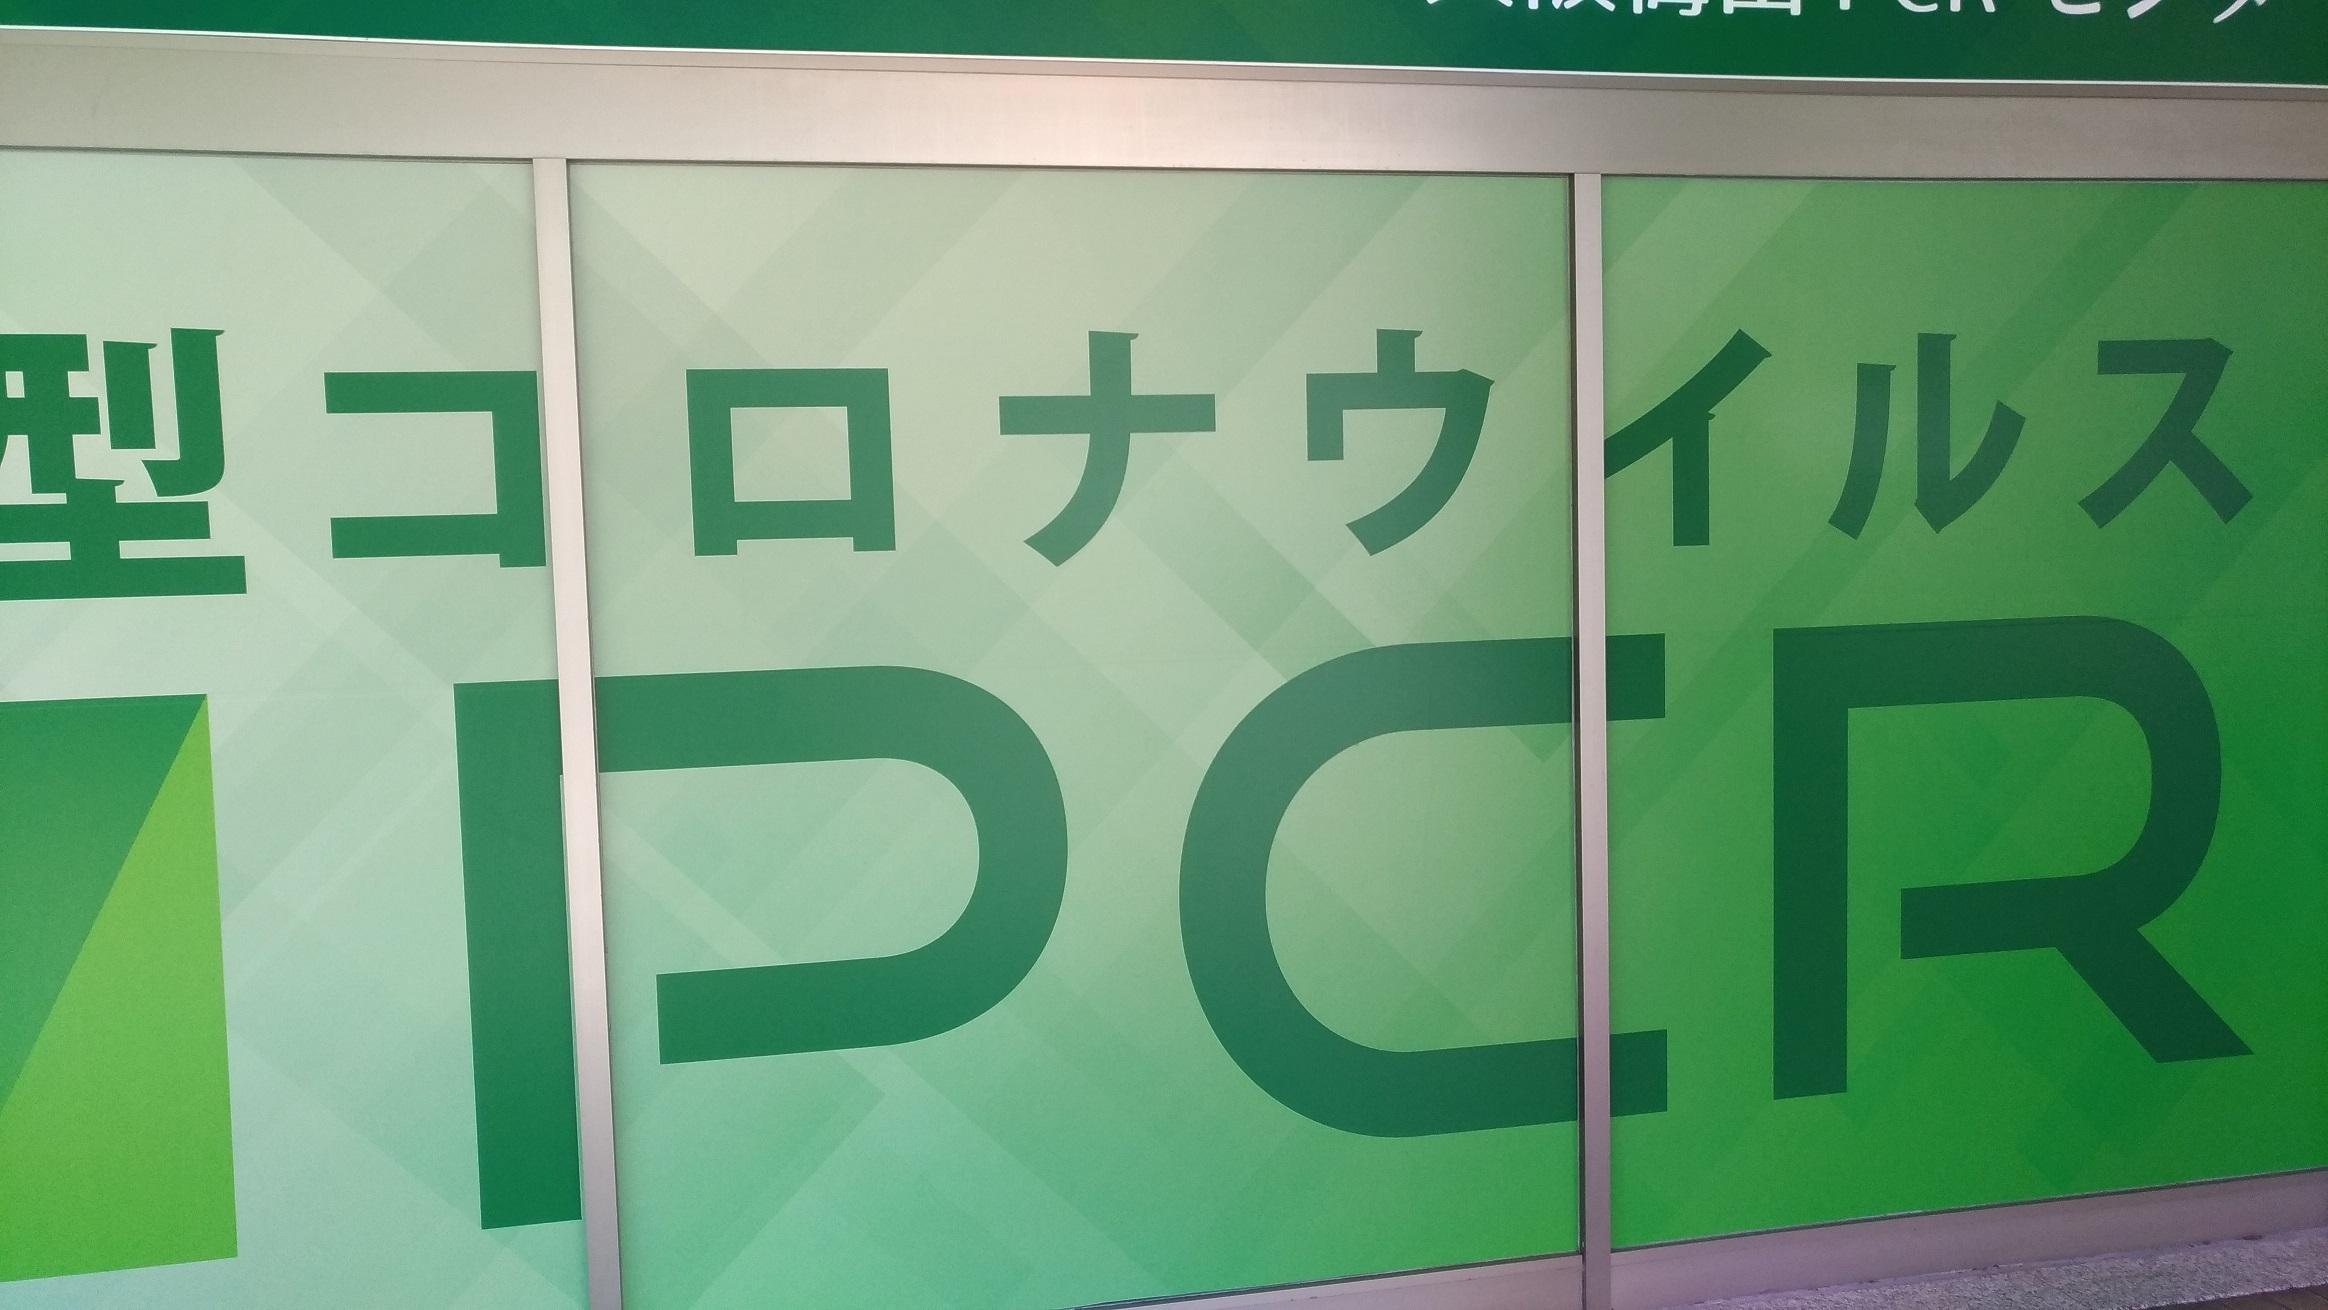 umeda_pcr_2021_041.jpg